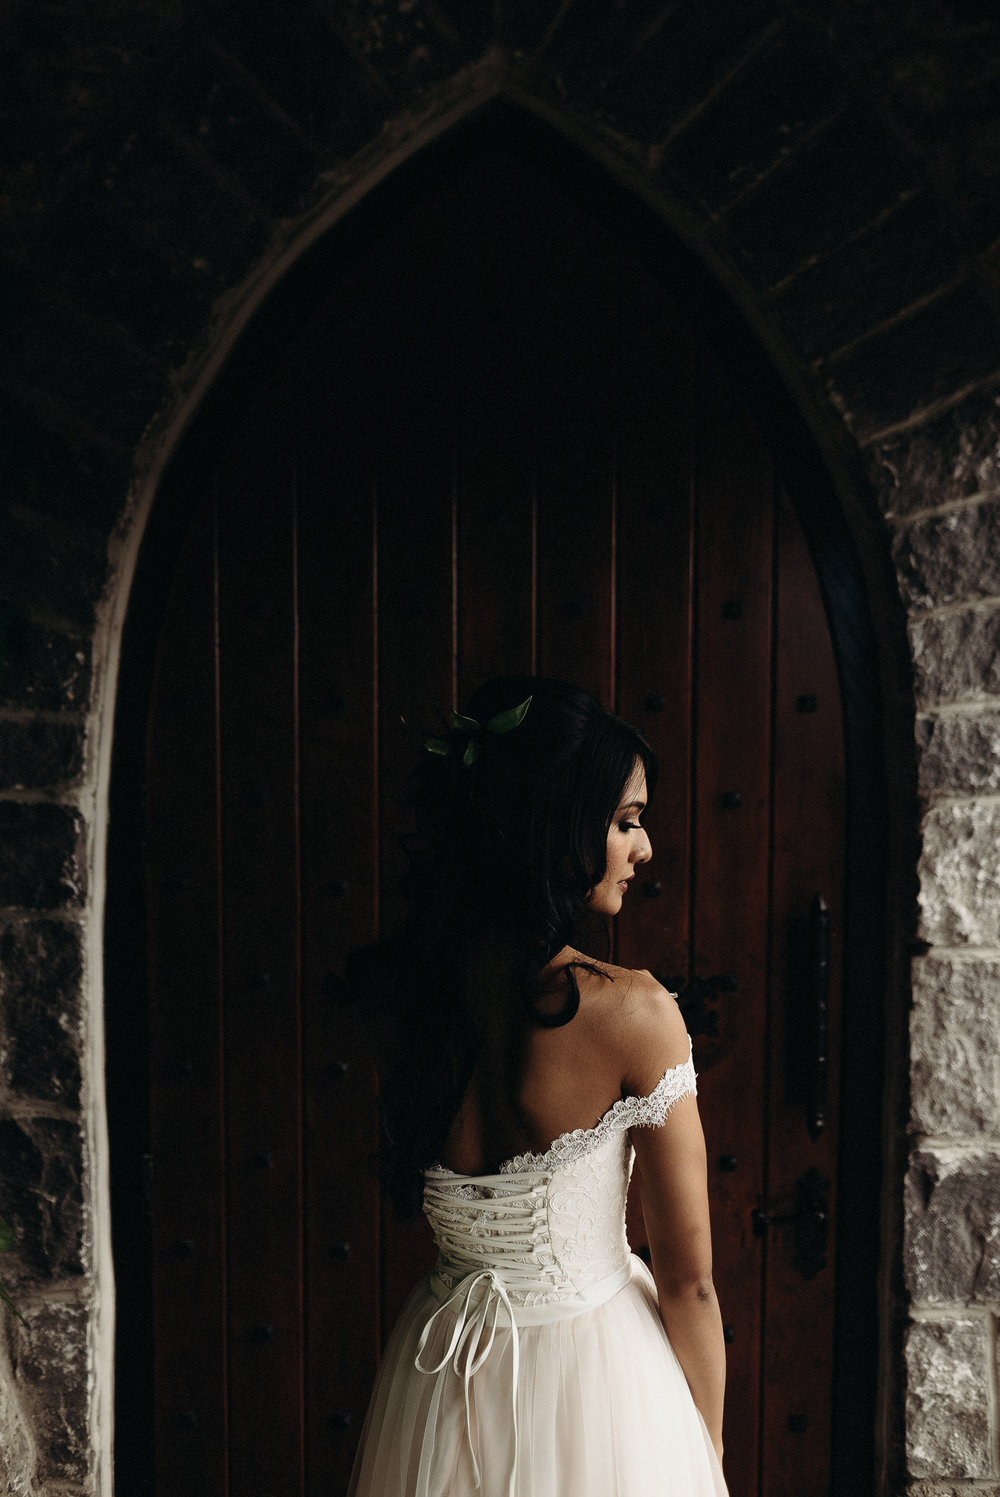 Alan&Naz- Barberstown Castle Wedding - Wedding photographer Ireland-61.jpg